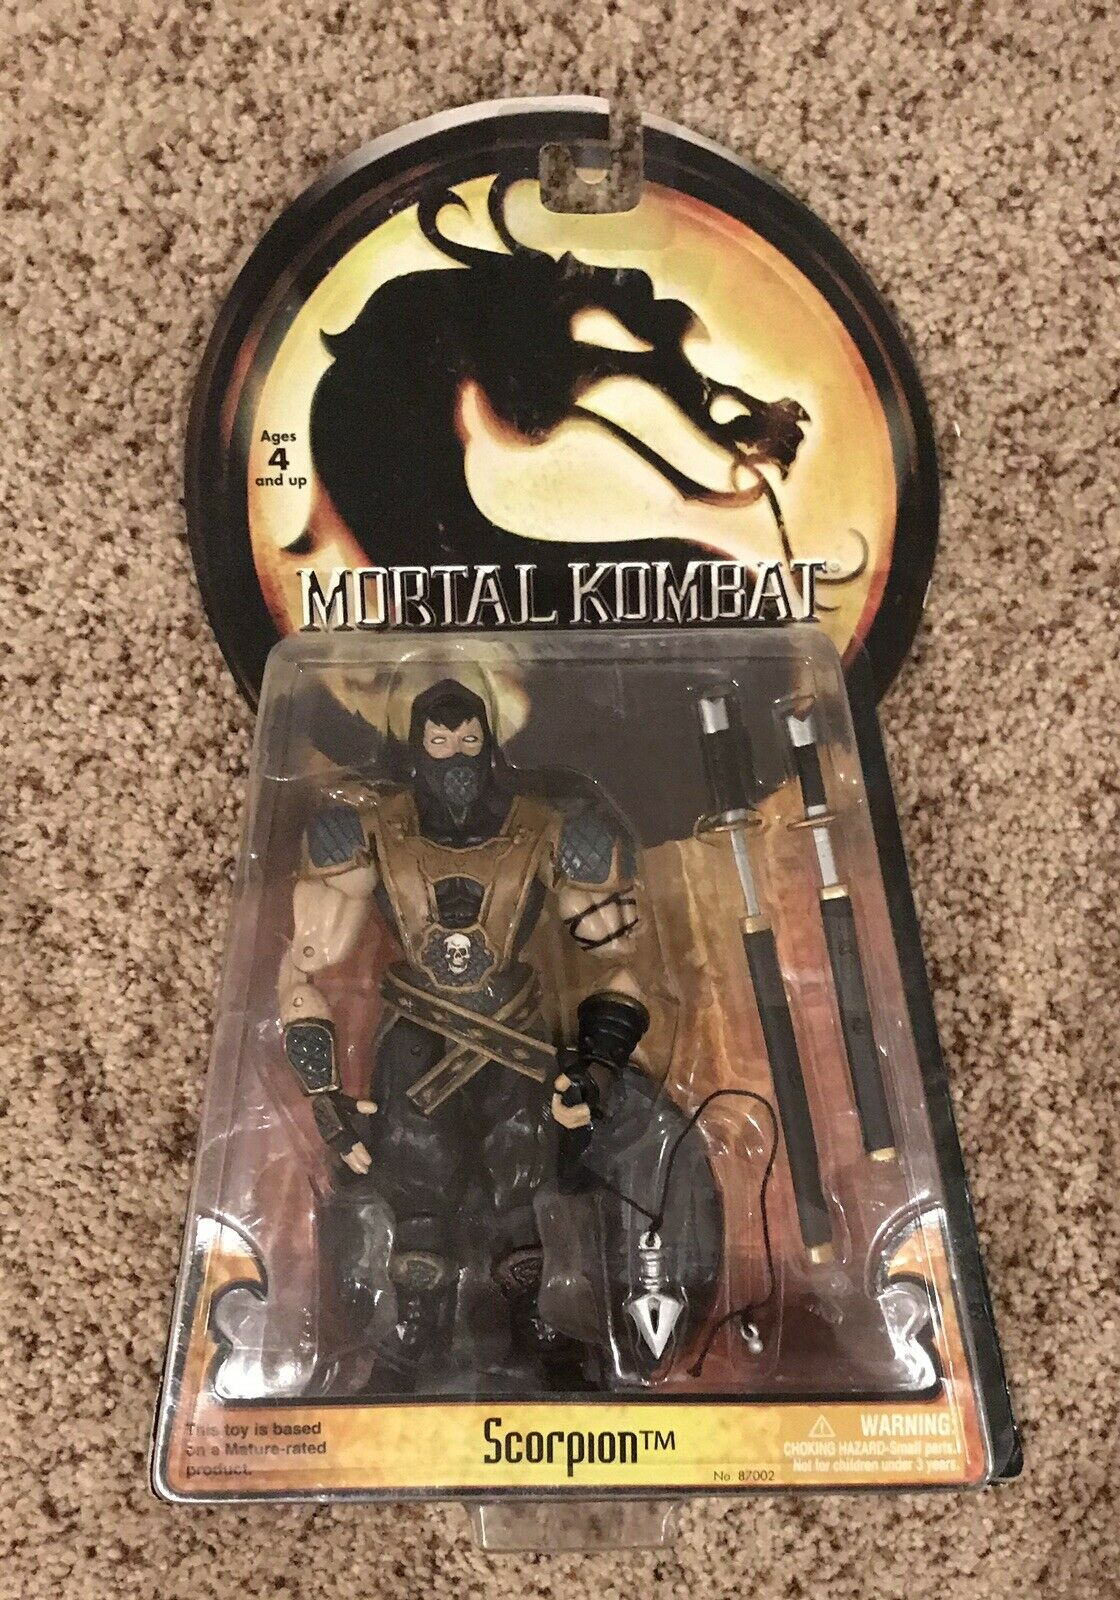 2005 Sealed Jazwares Mortal Kombat Shaolin Monks SCORPION Action Figure New